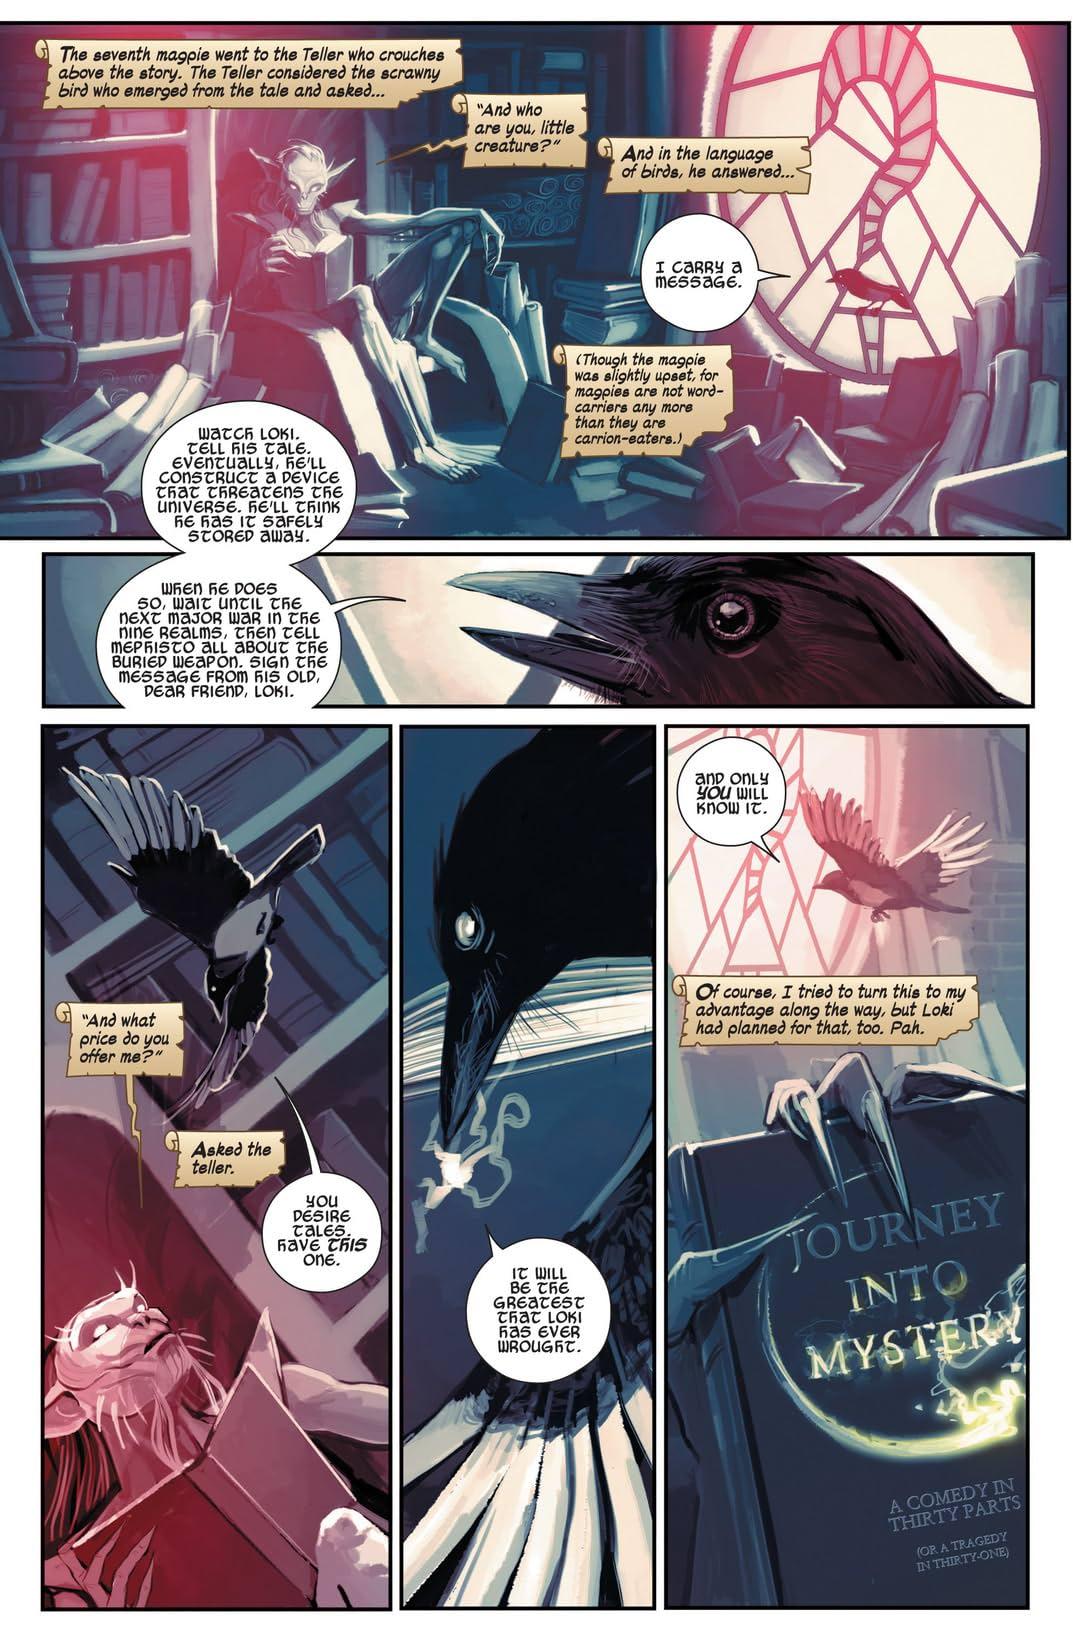 Journey Into Mystery #645